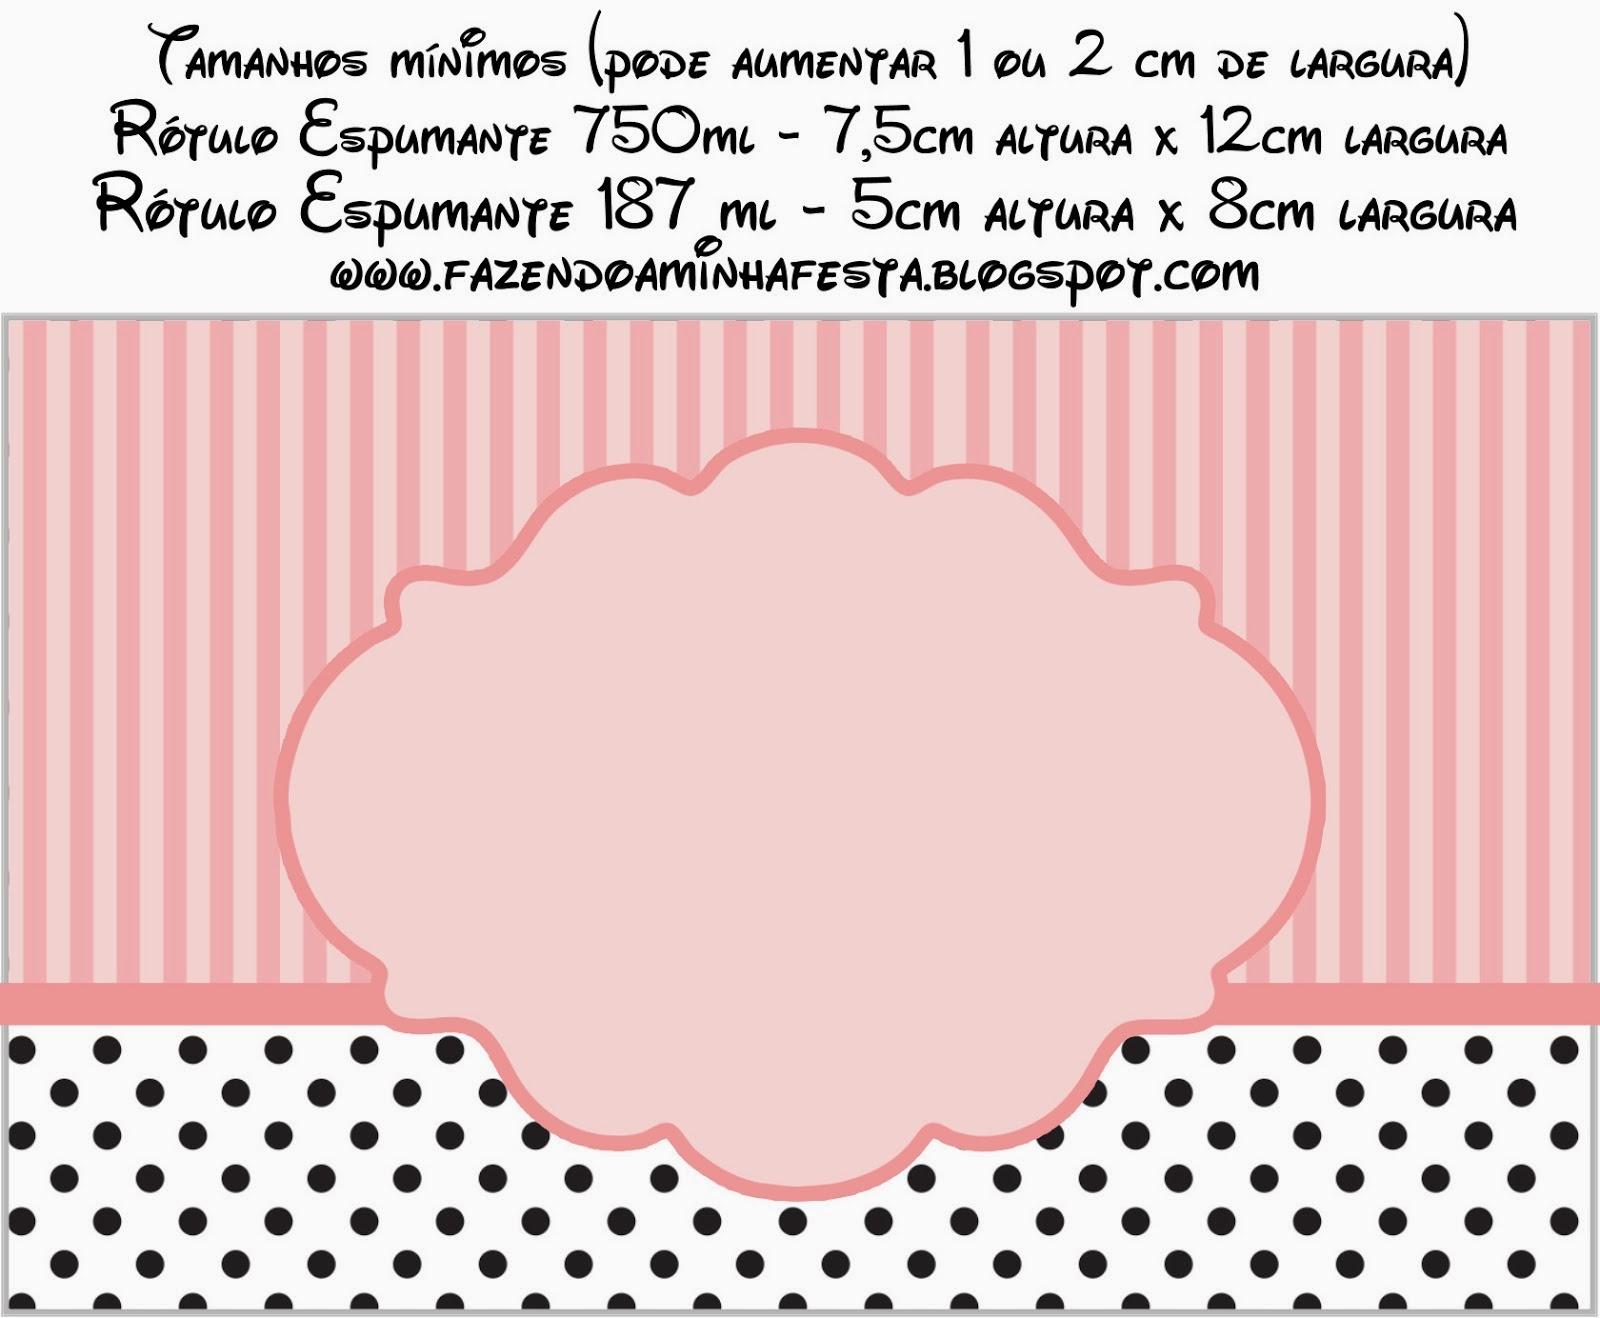 Free Downloadable Invitation Templates was nice invitation template